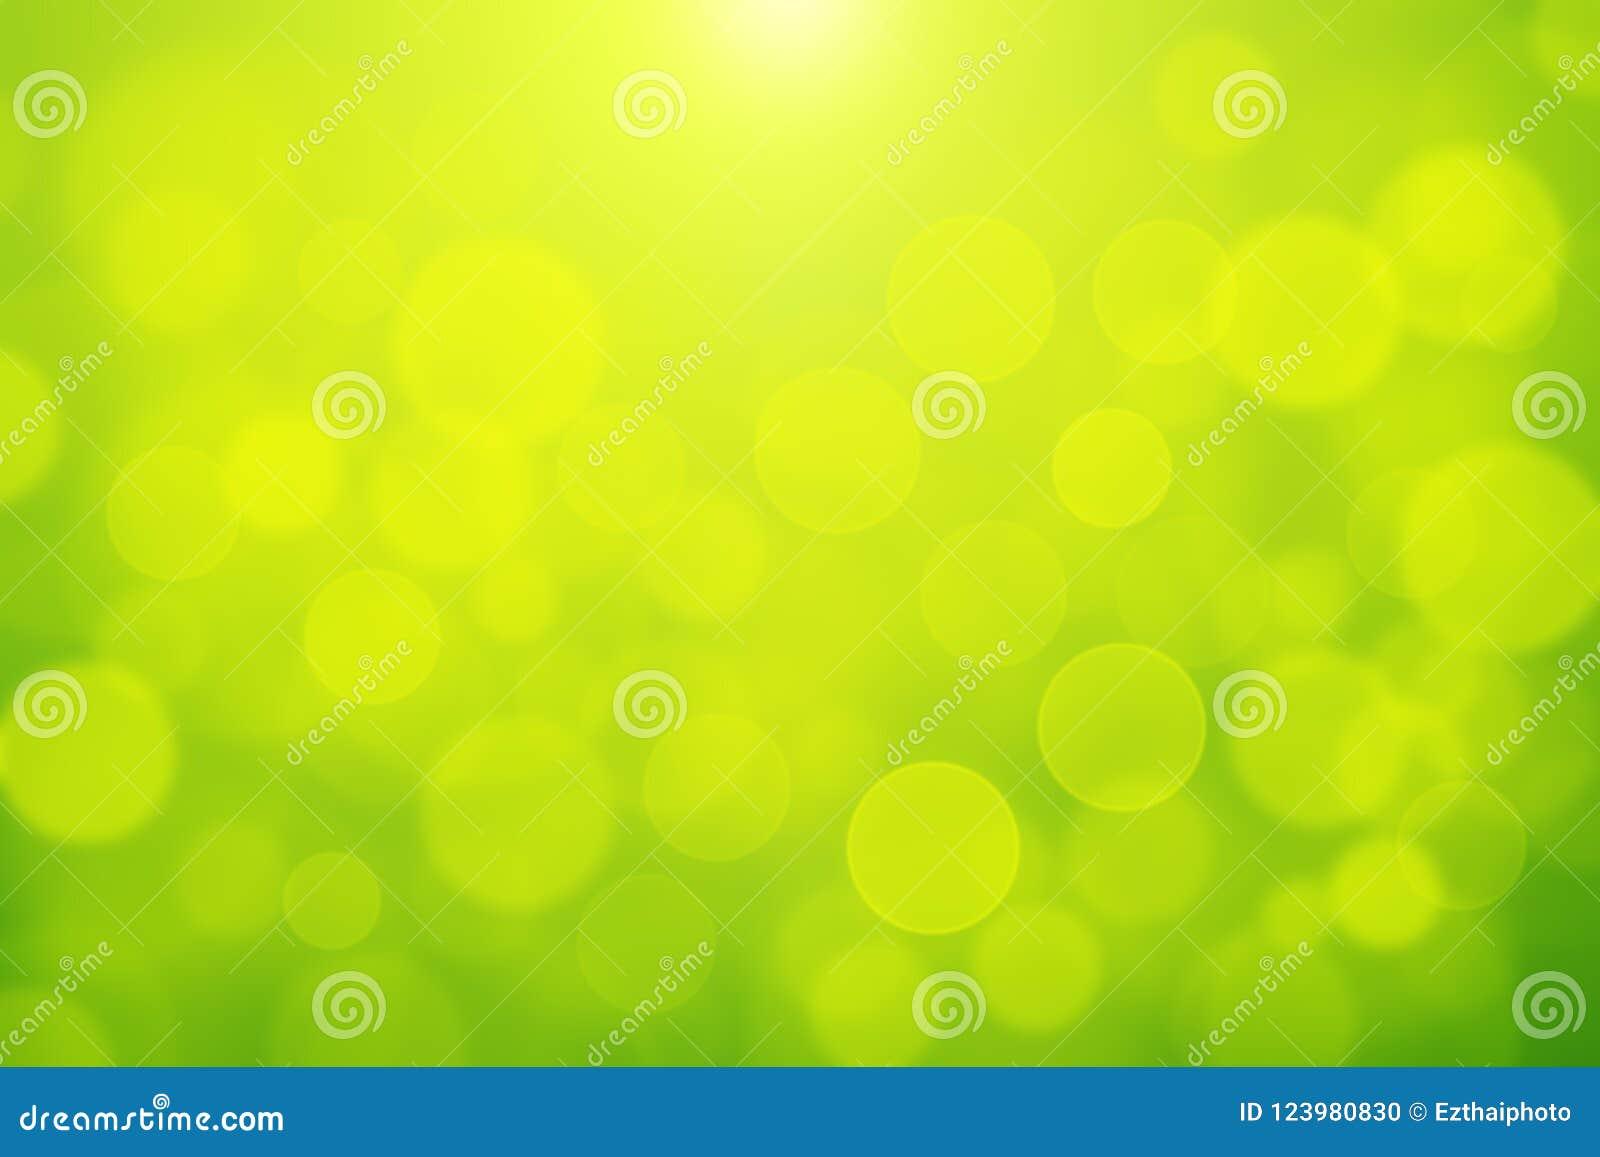 Groene bokeh abstracte lichte blurly witte bokeh als achtergrond op gele en groene achtergrond